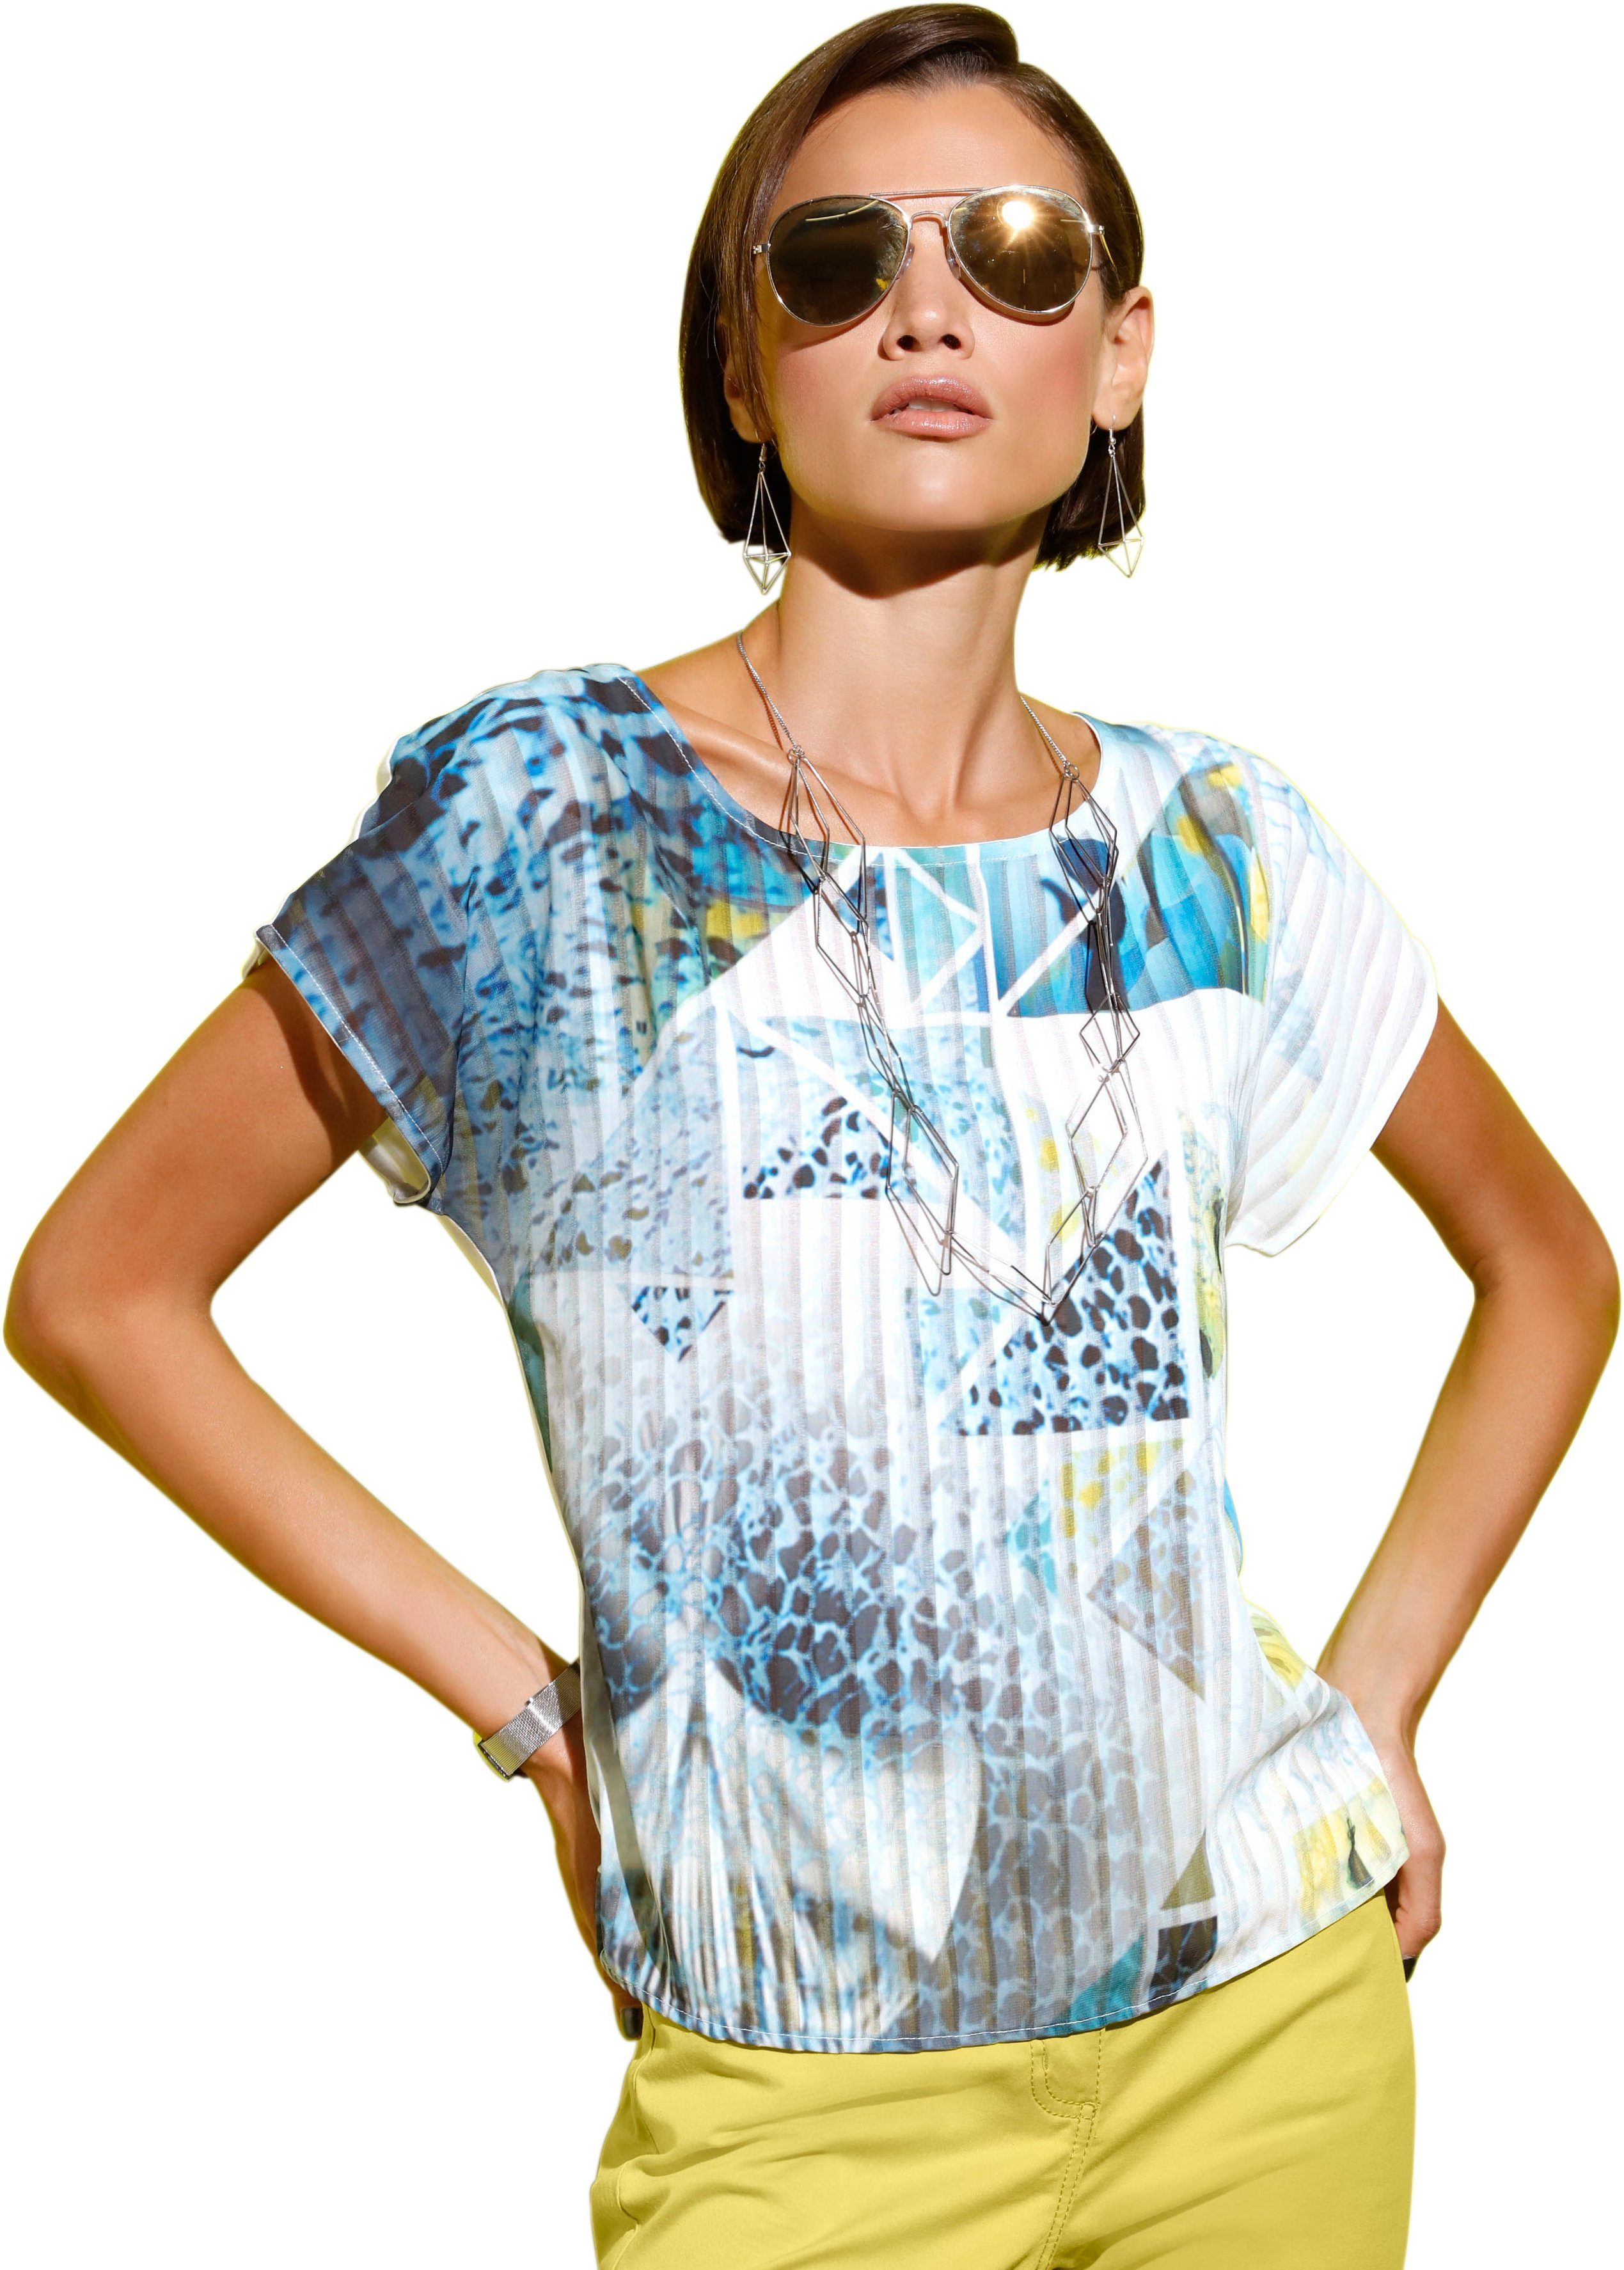 création L Blusenshirt aus kombistark bedrucktem Blusenstoff